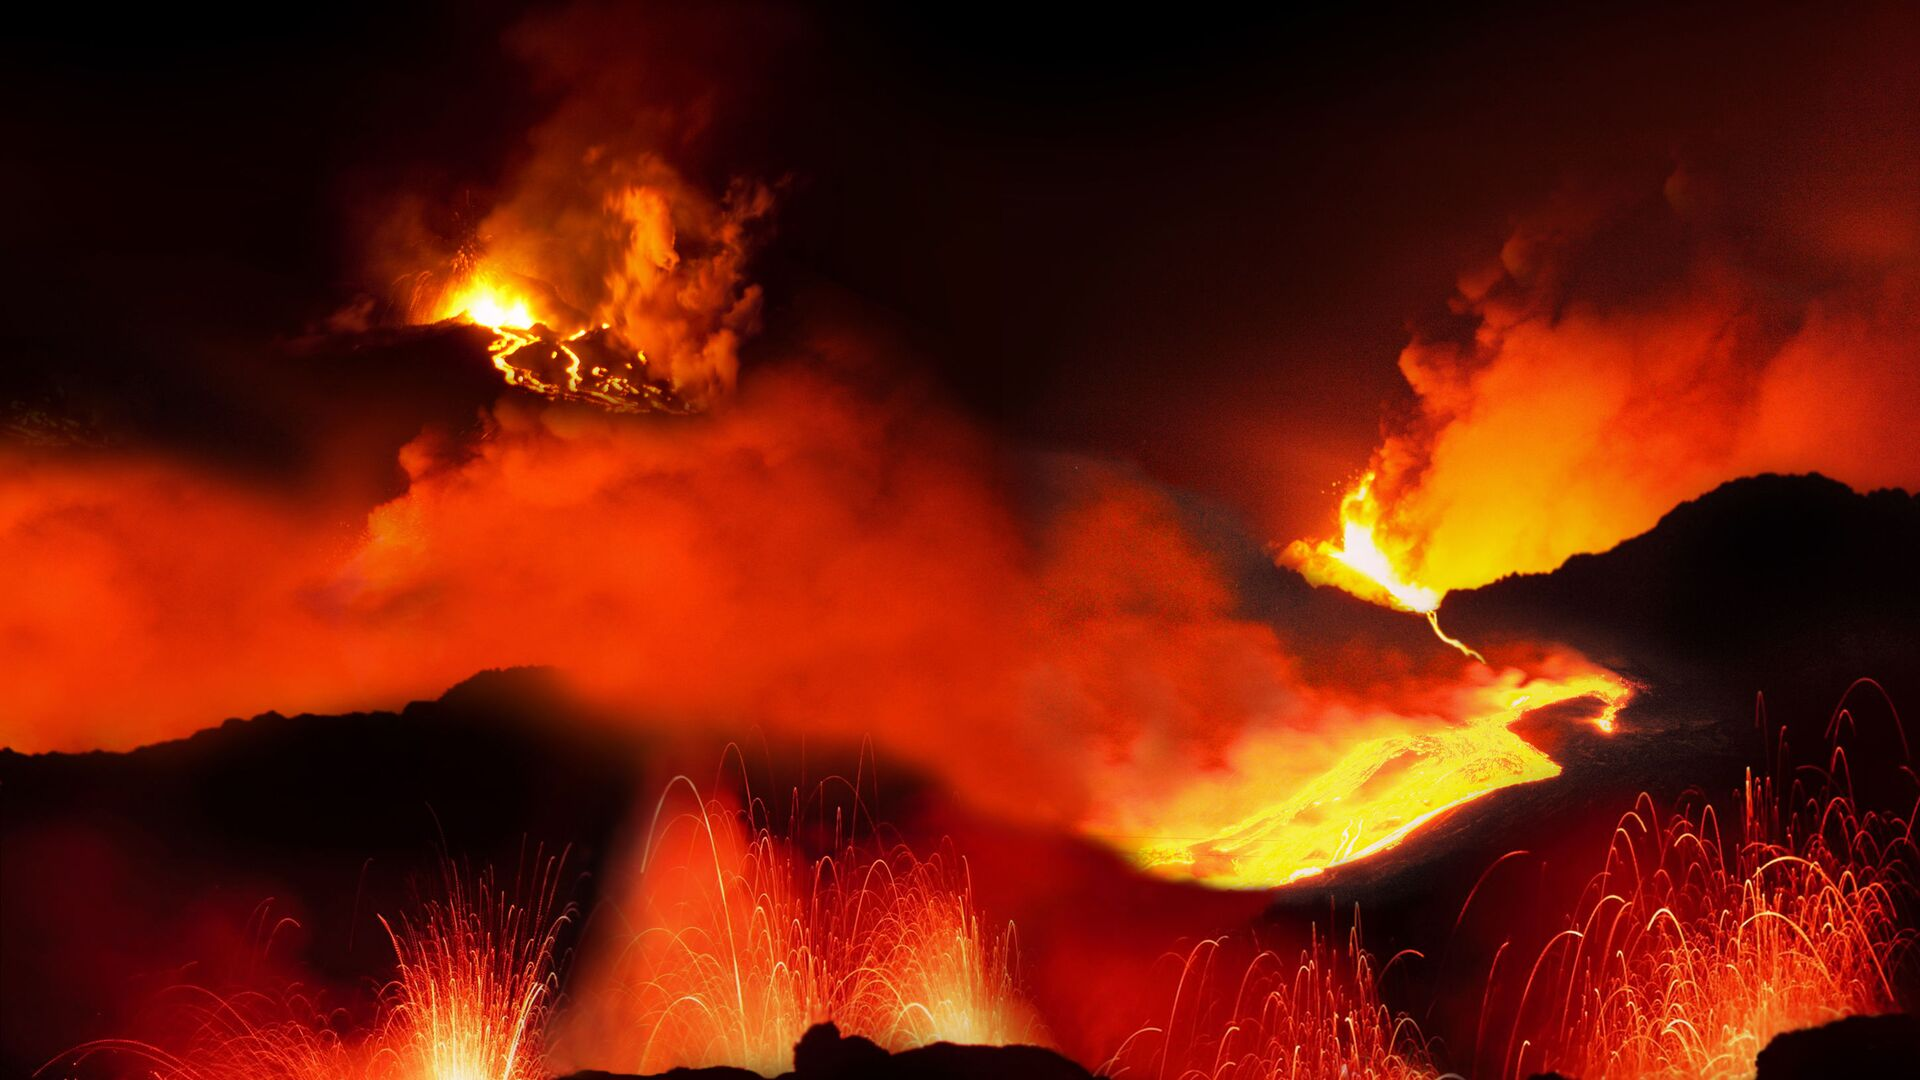 Volcanic eruption - Sputnik International, 1920, 21.09.2021